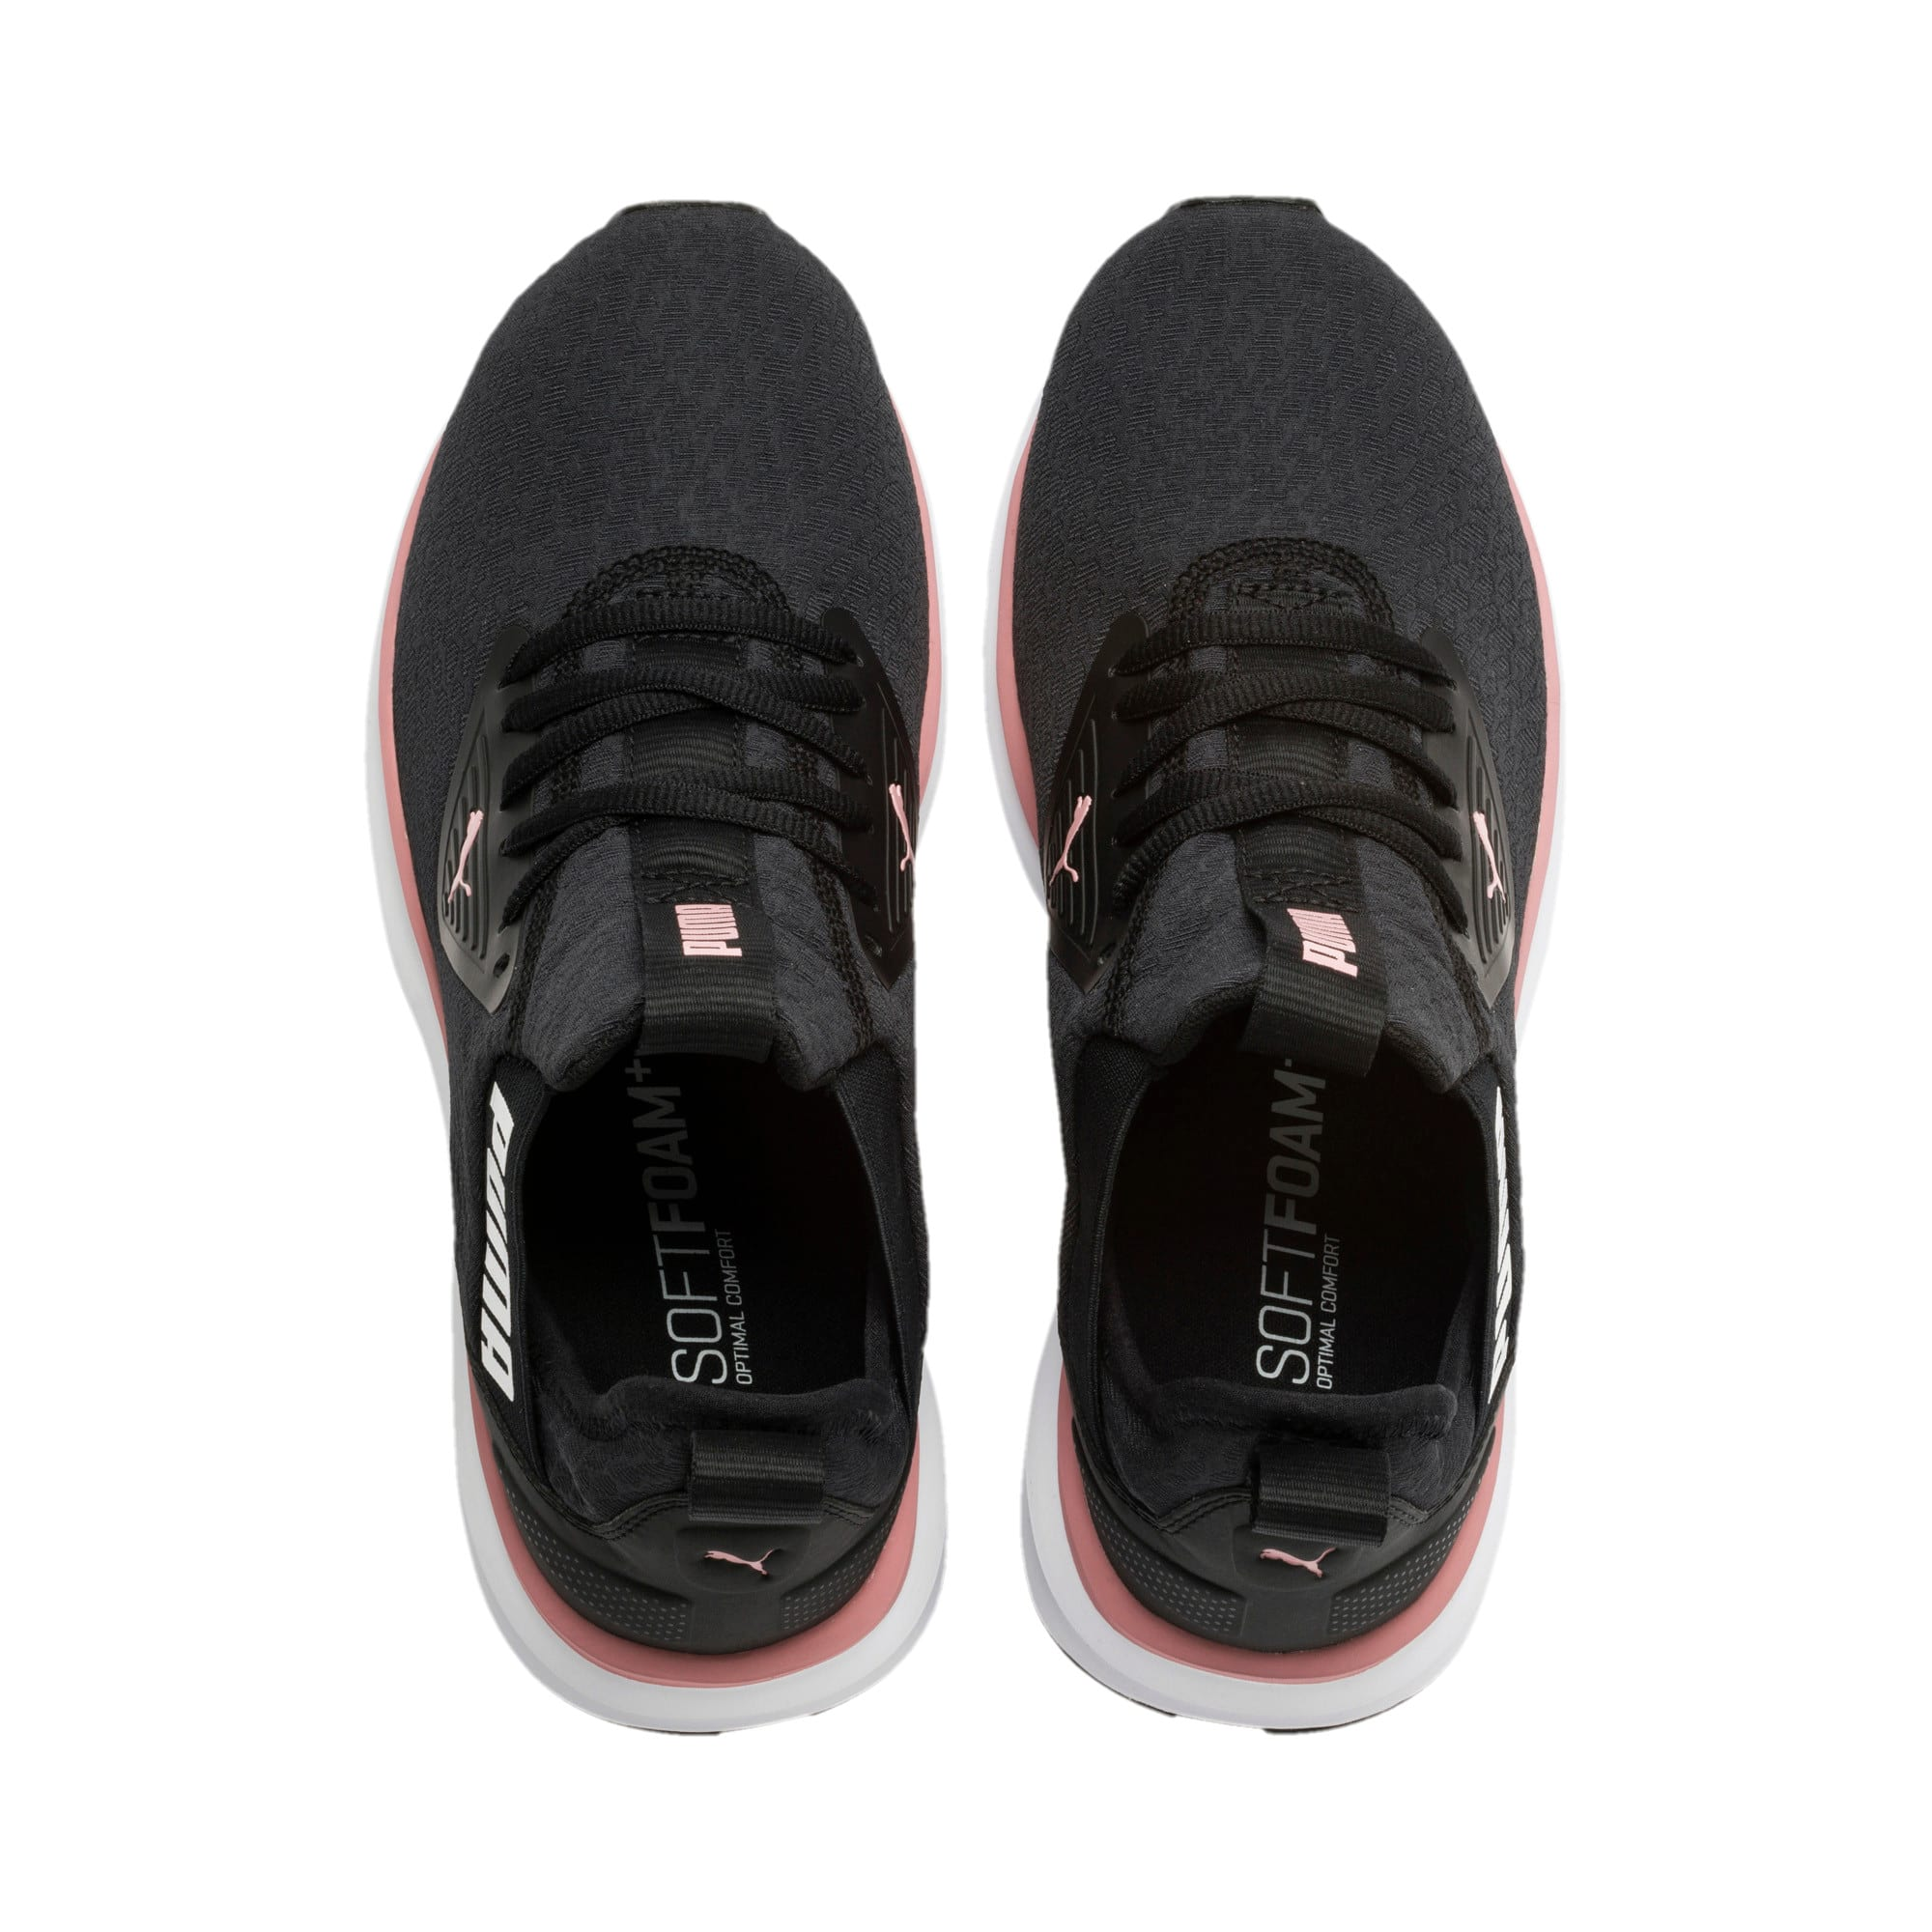 Thumbnail 7 of Enzo Beta Fluid Women's Training Shoes, Puma Black-Bridal Rose, medium